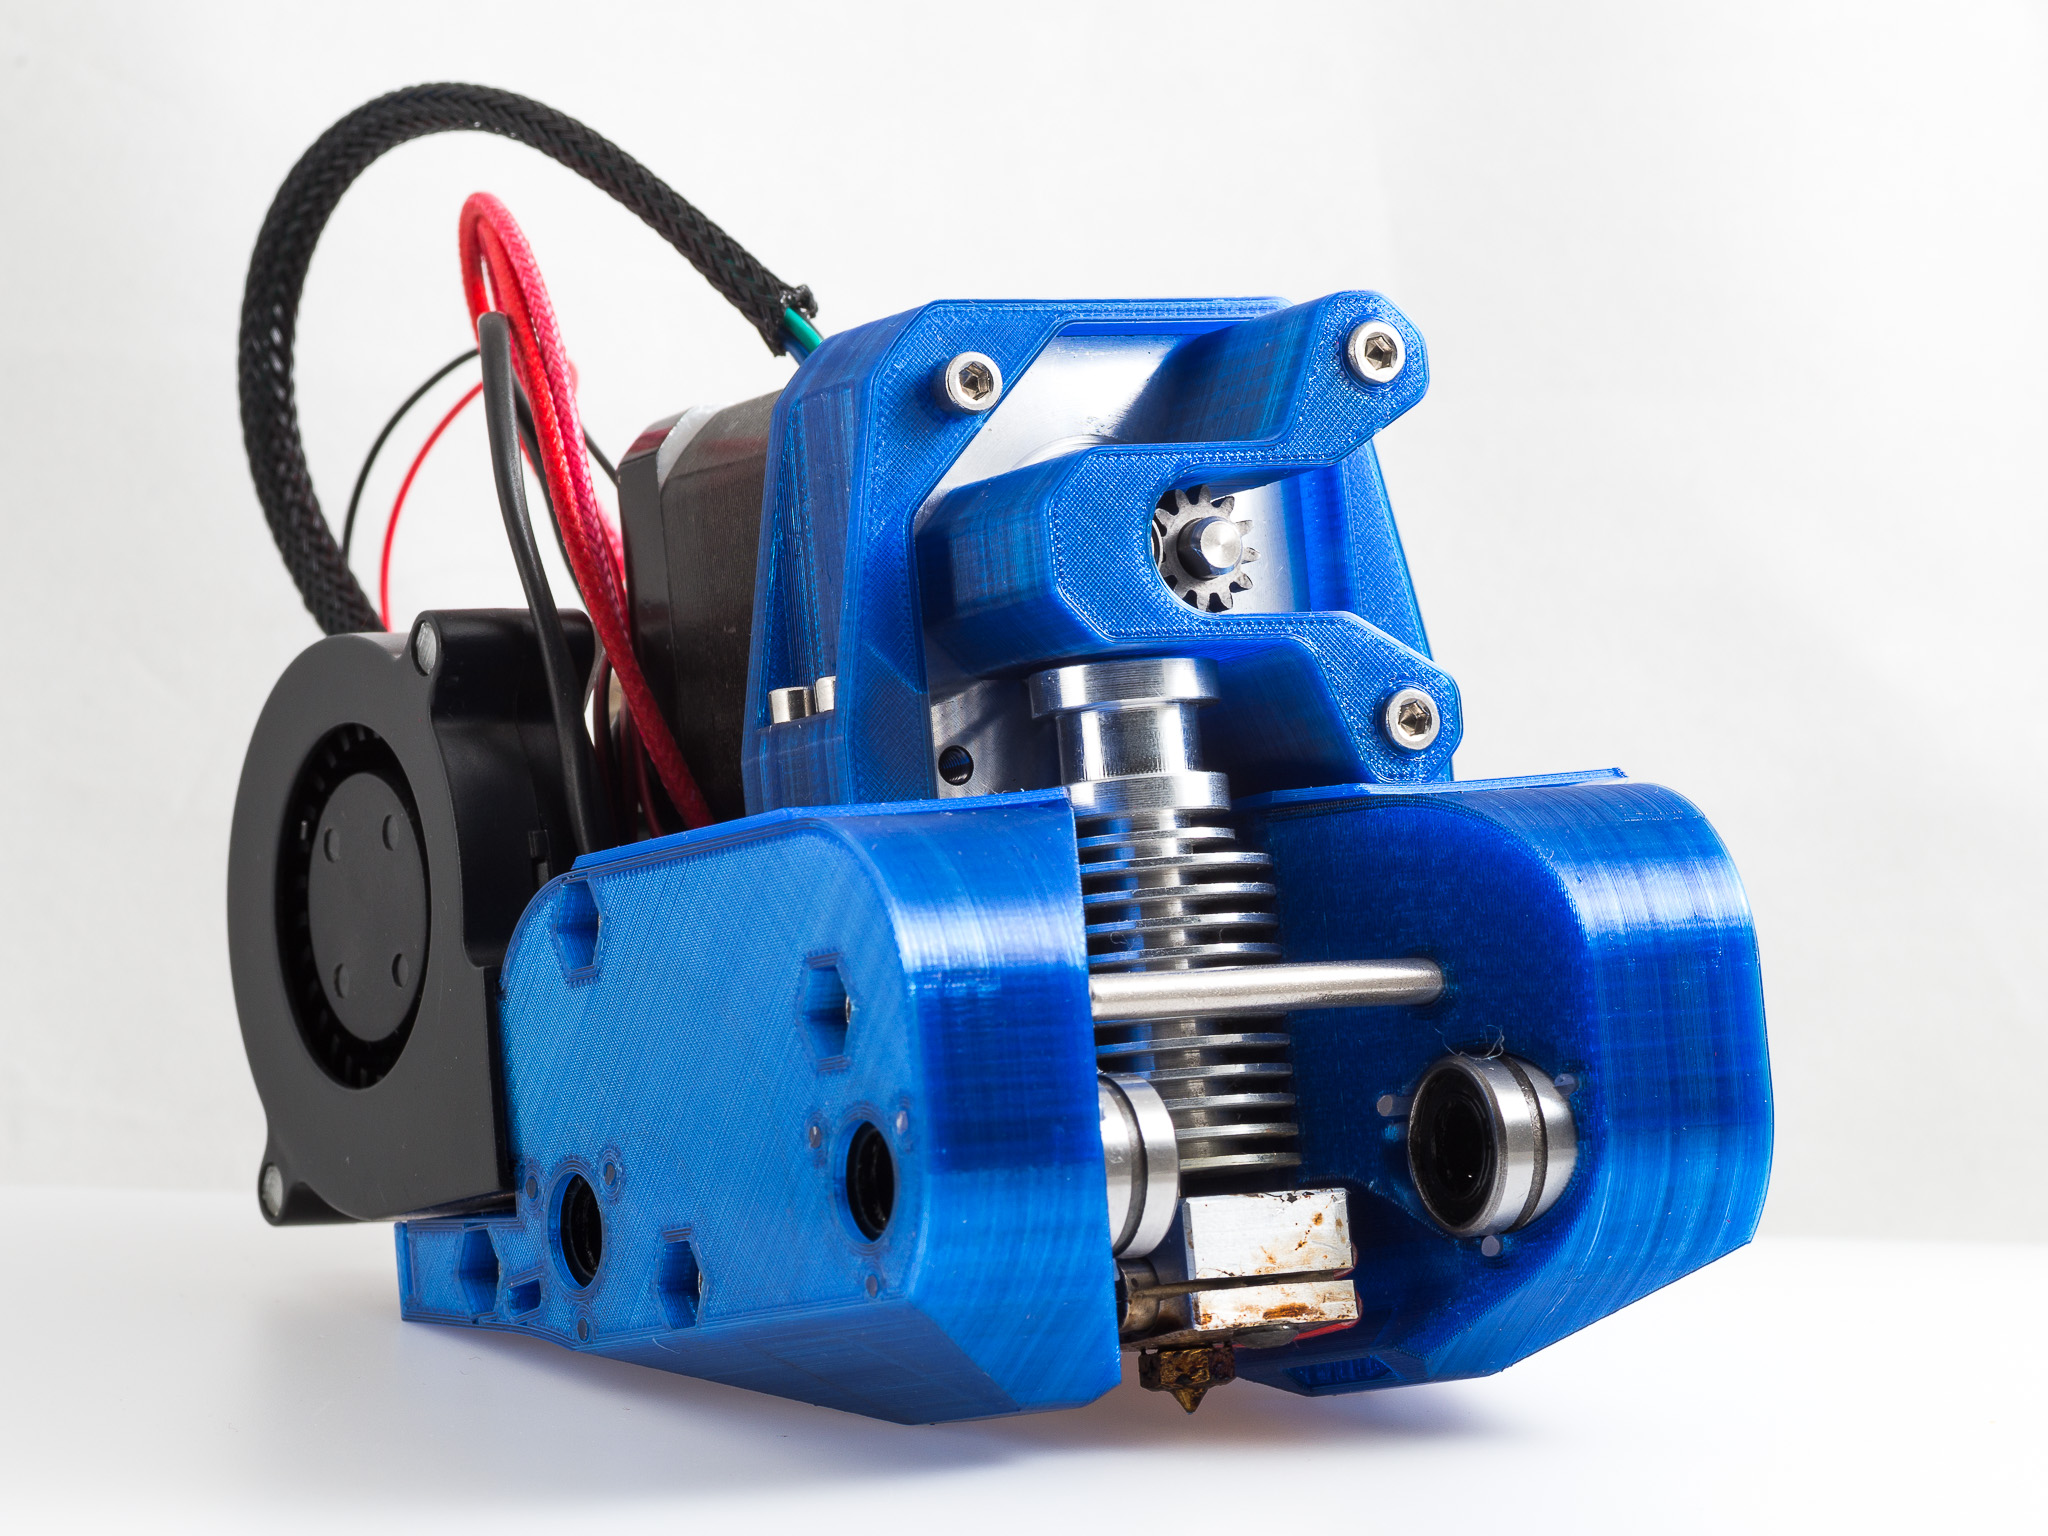 IMGP0351.jpg Download free STL file Extruder Mount (Printrbot Gear Head) • 3D printable design, WalterHsiao